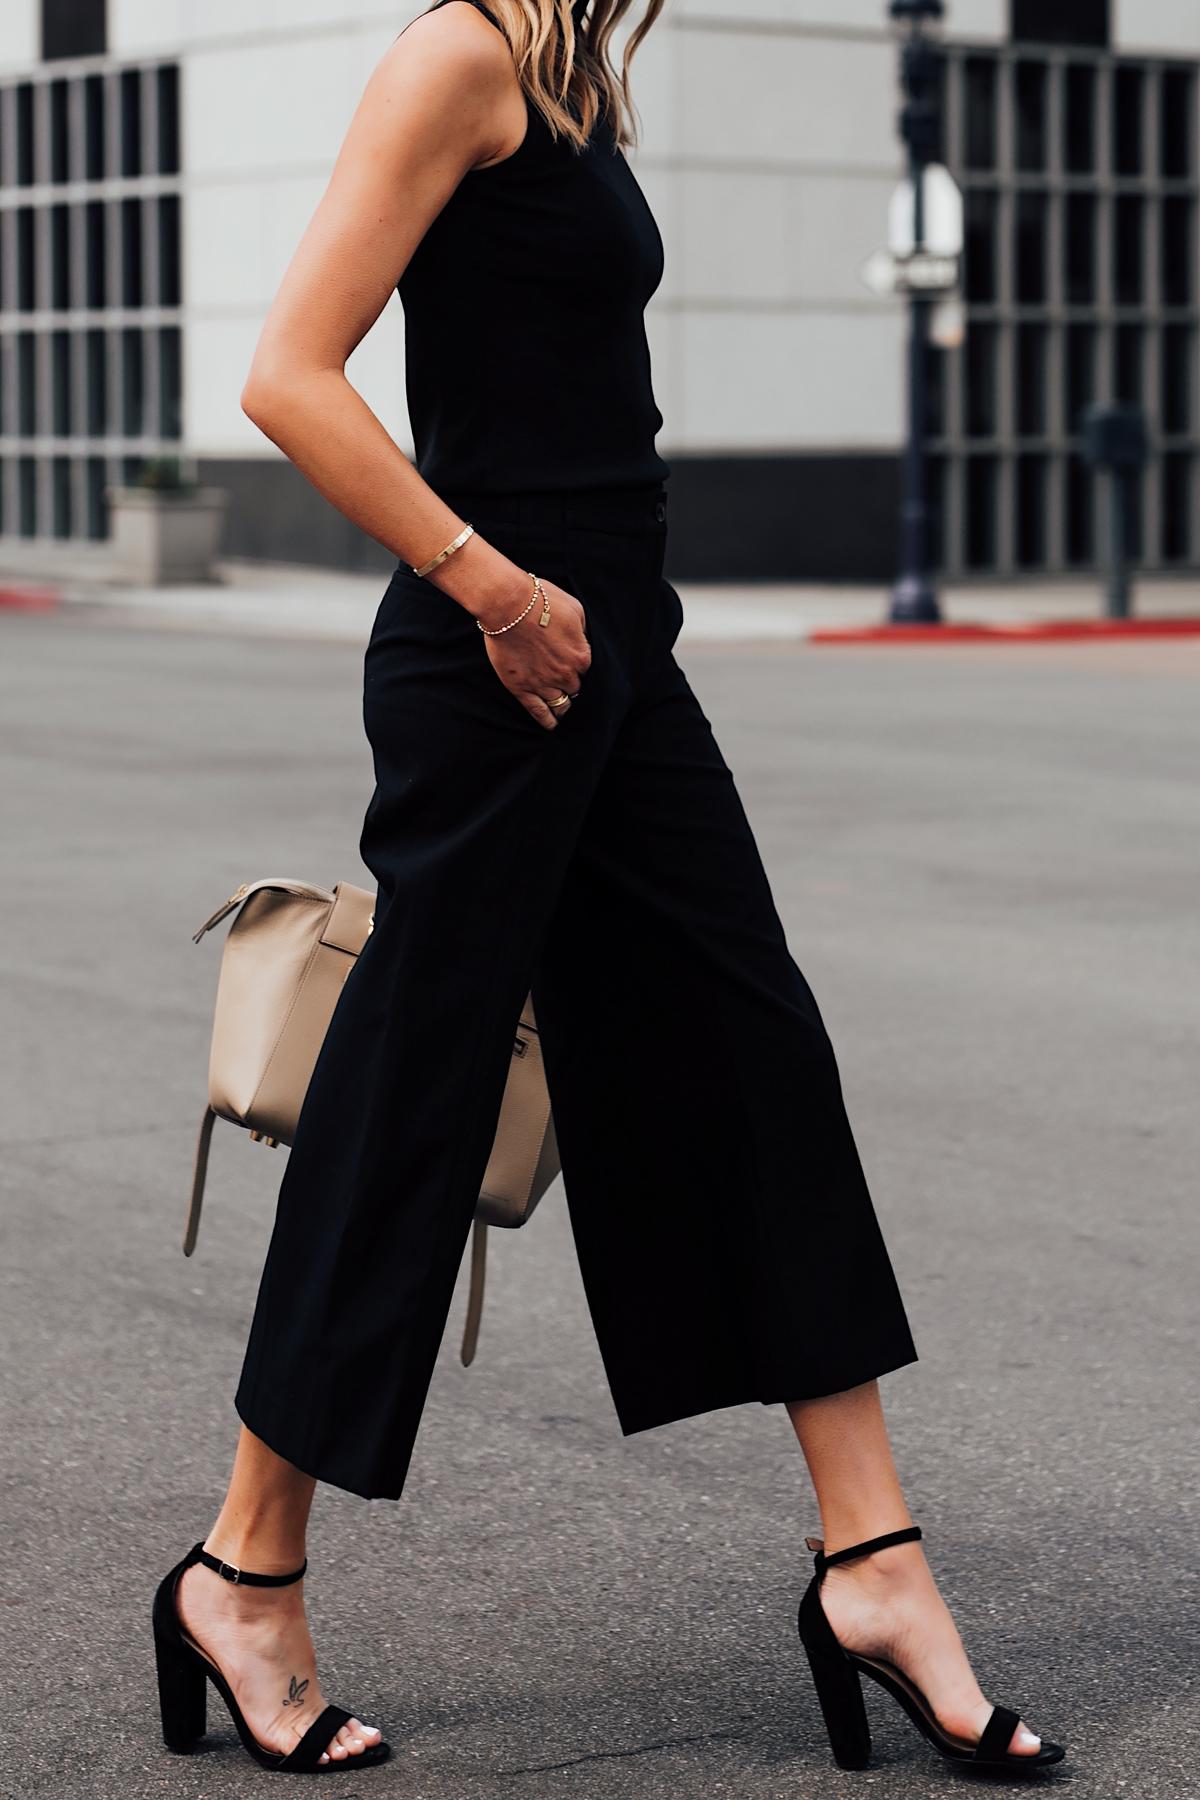 Woman Wearing Ann Taylor Black Sweater Tank Ann Taylor Black Wide Leg Cropped Pants Black Heeled Sandals Fashion Jackson San Diego Fashion Blogger Street Style